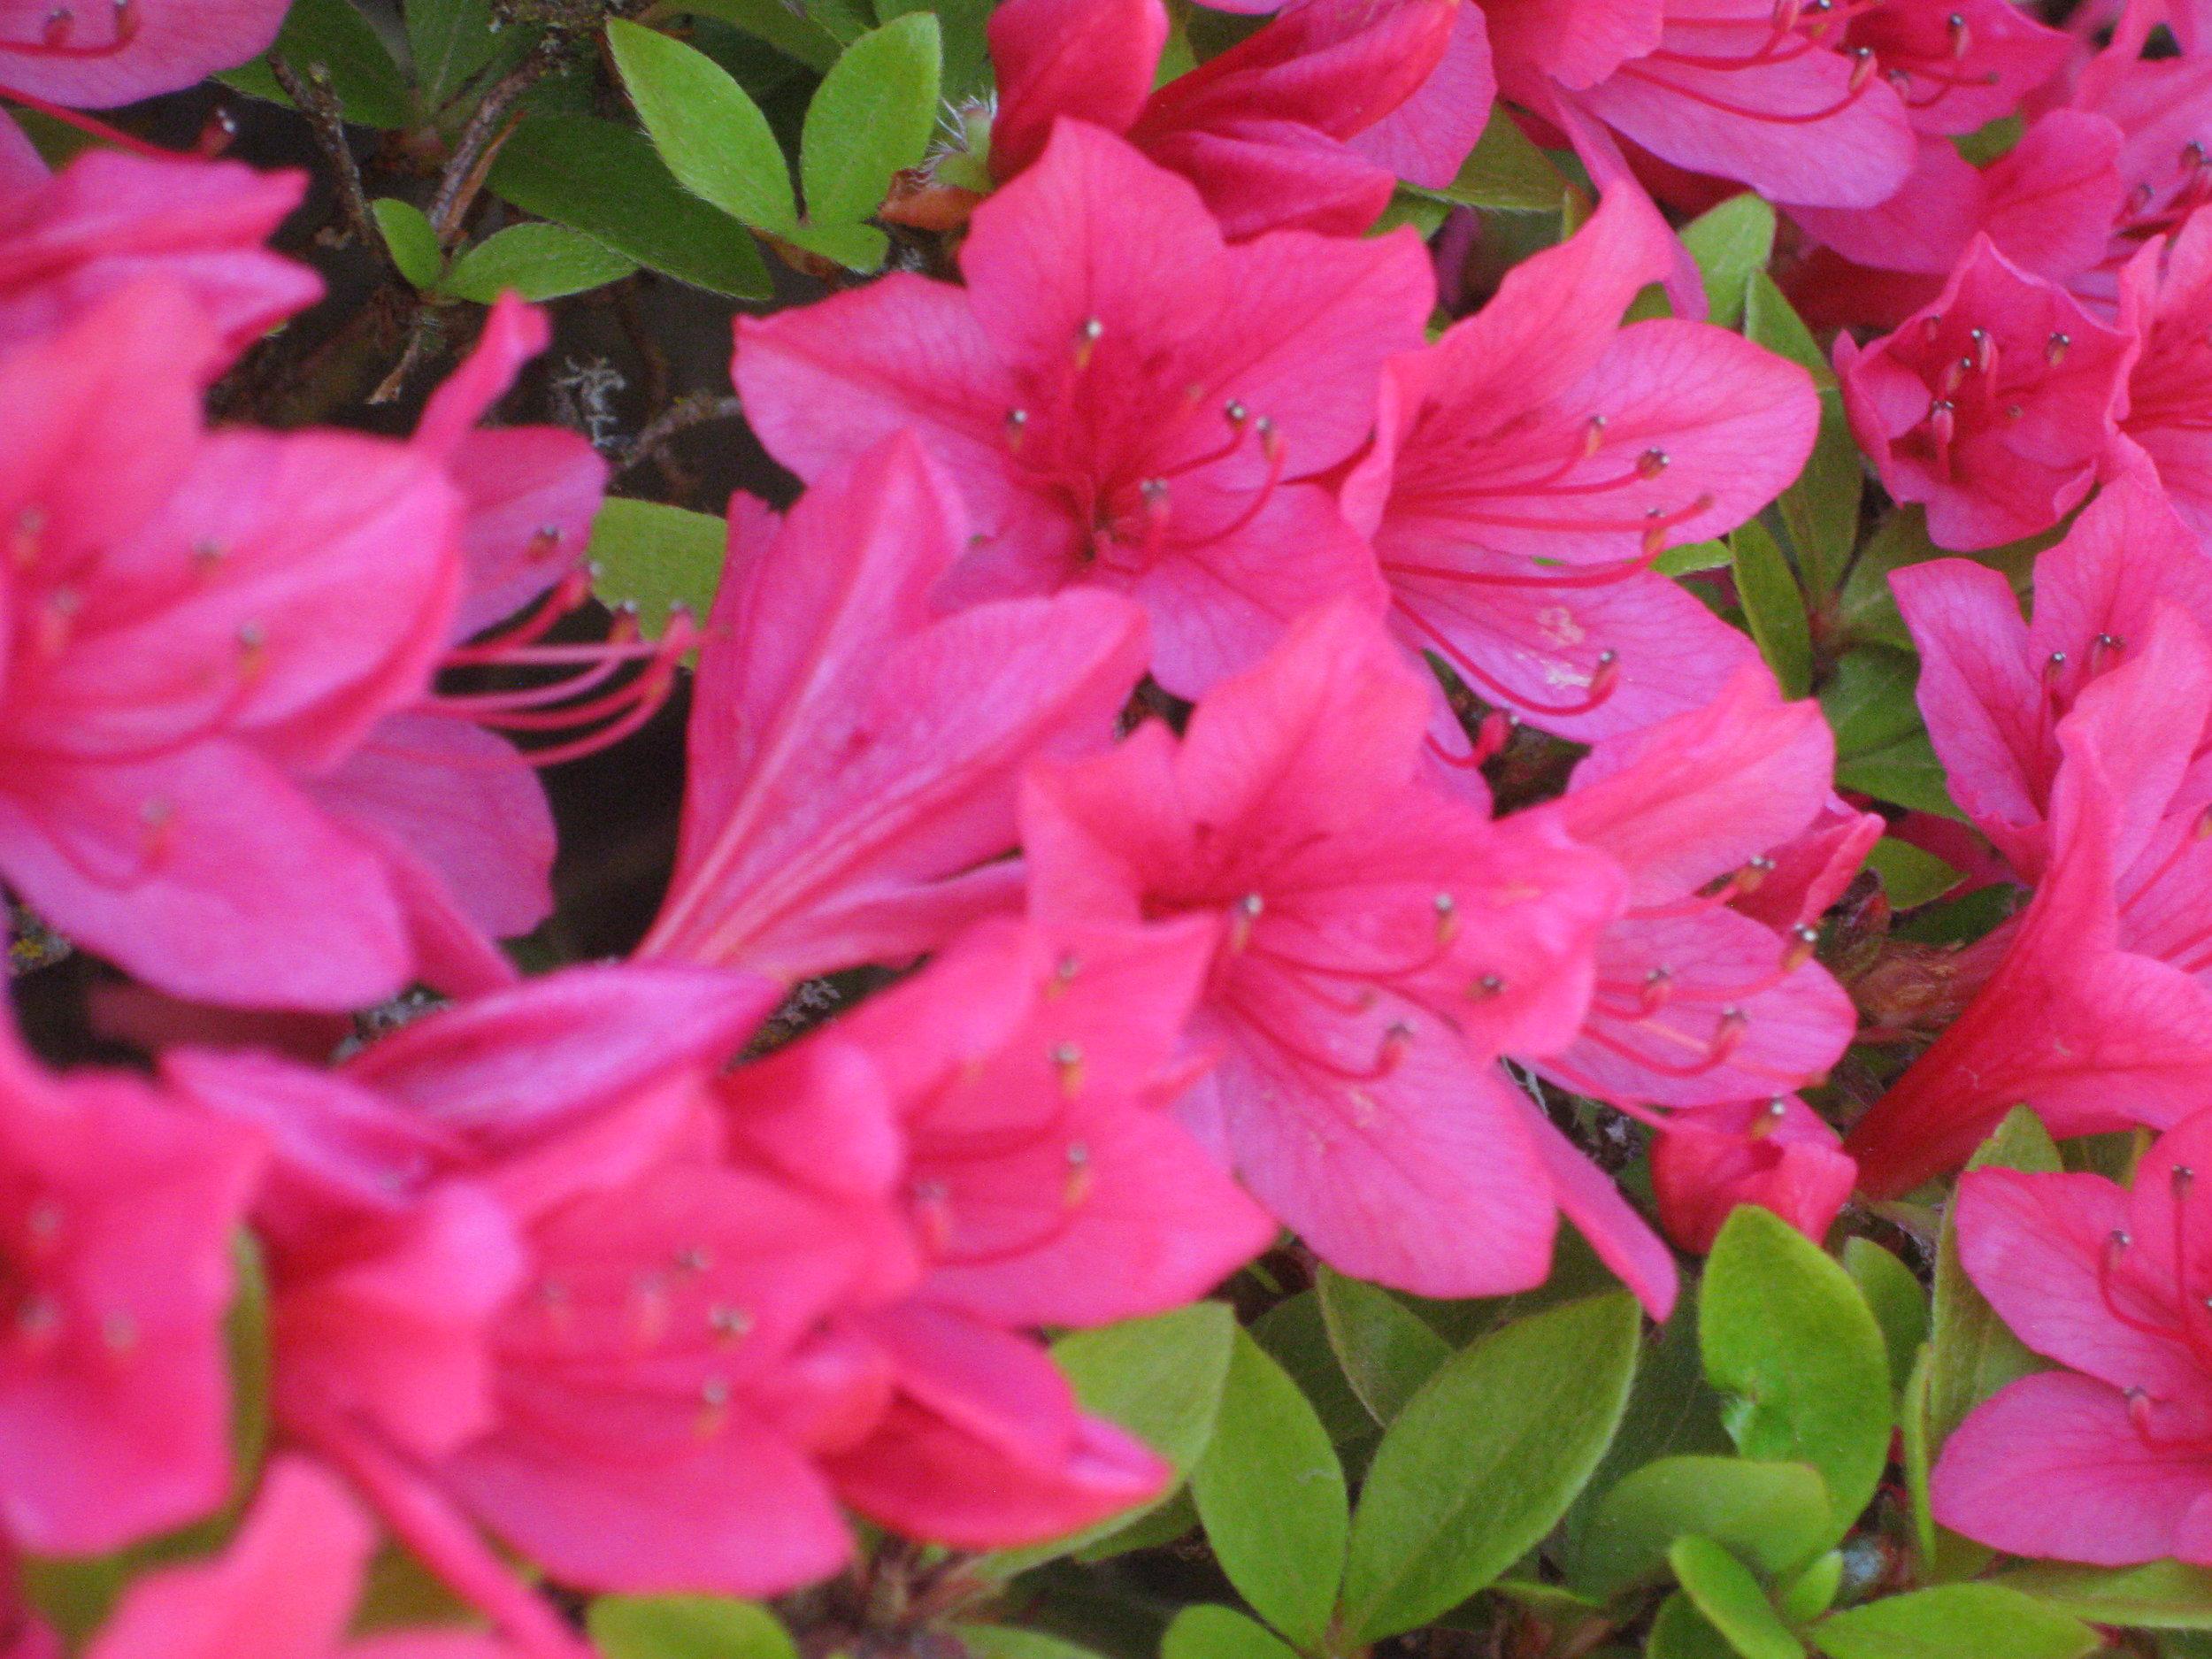 The Arnold Azalea's flowers (photo by Aleks Monk, May 6, 2012)